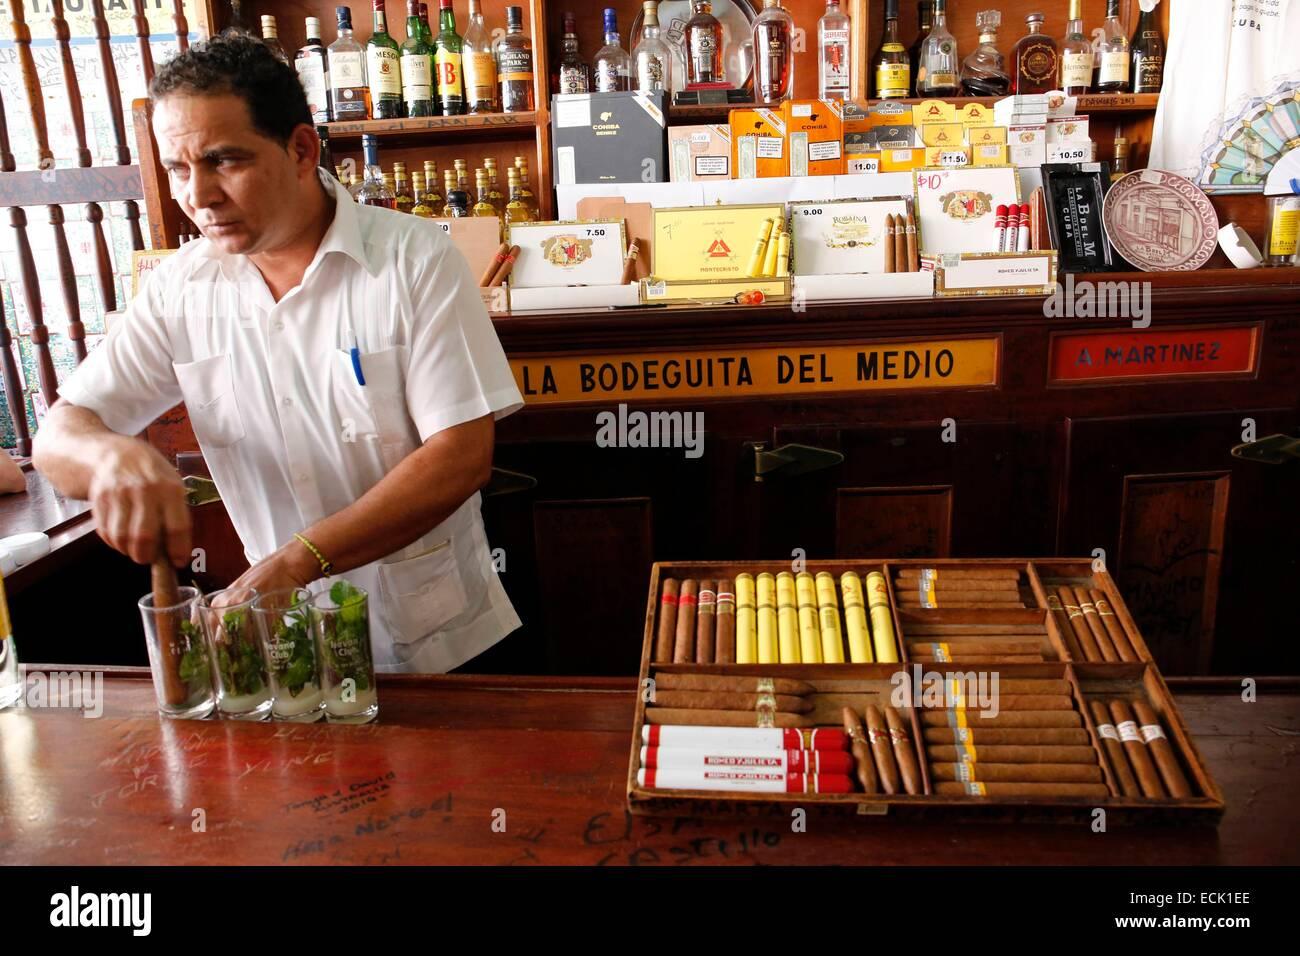 Kuba, Havanna, La Bodeguita del Medio, berühmt für ihre Cocktails Mojito Stockbild